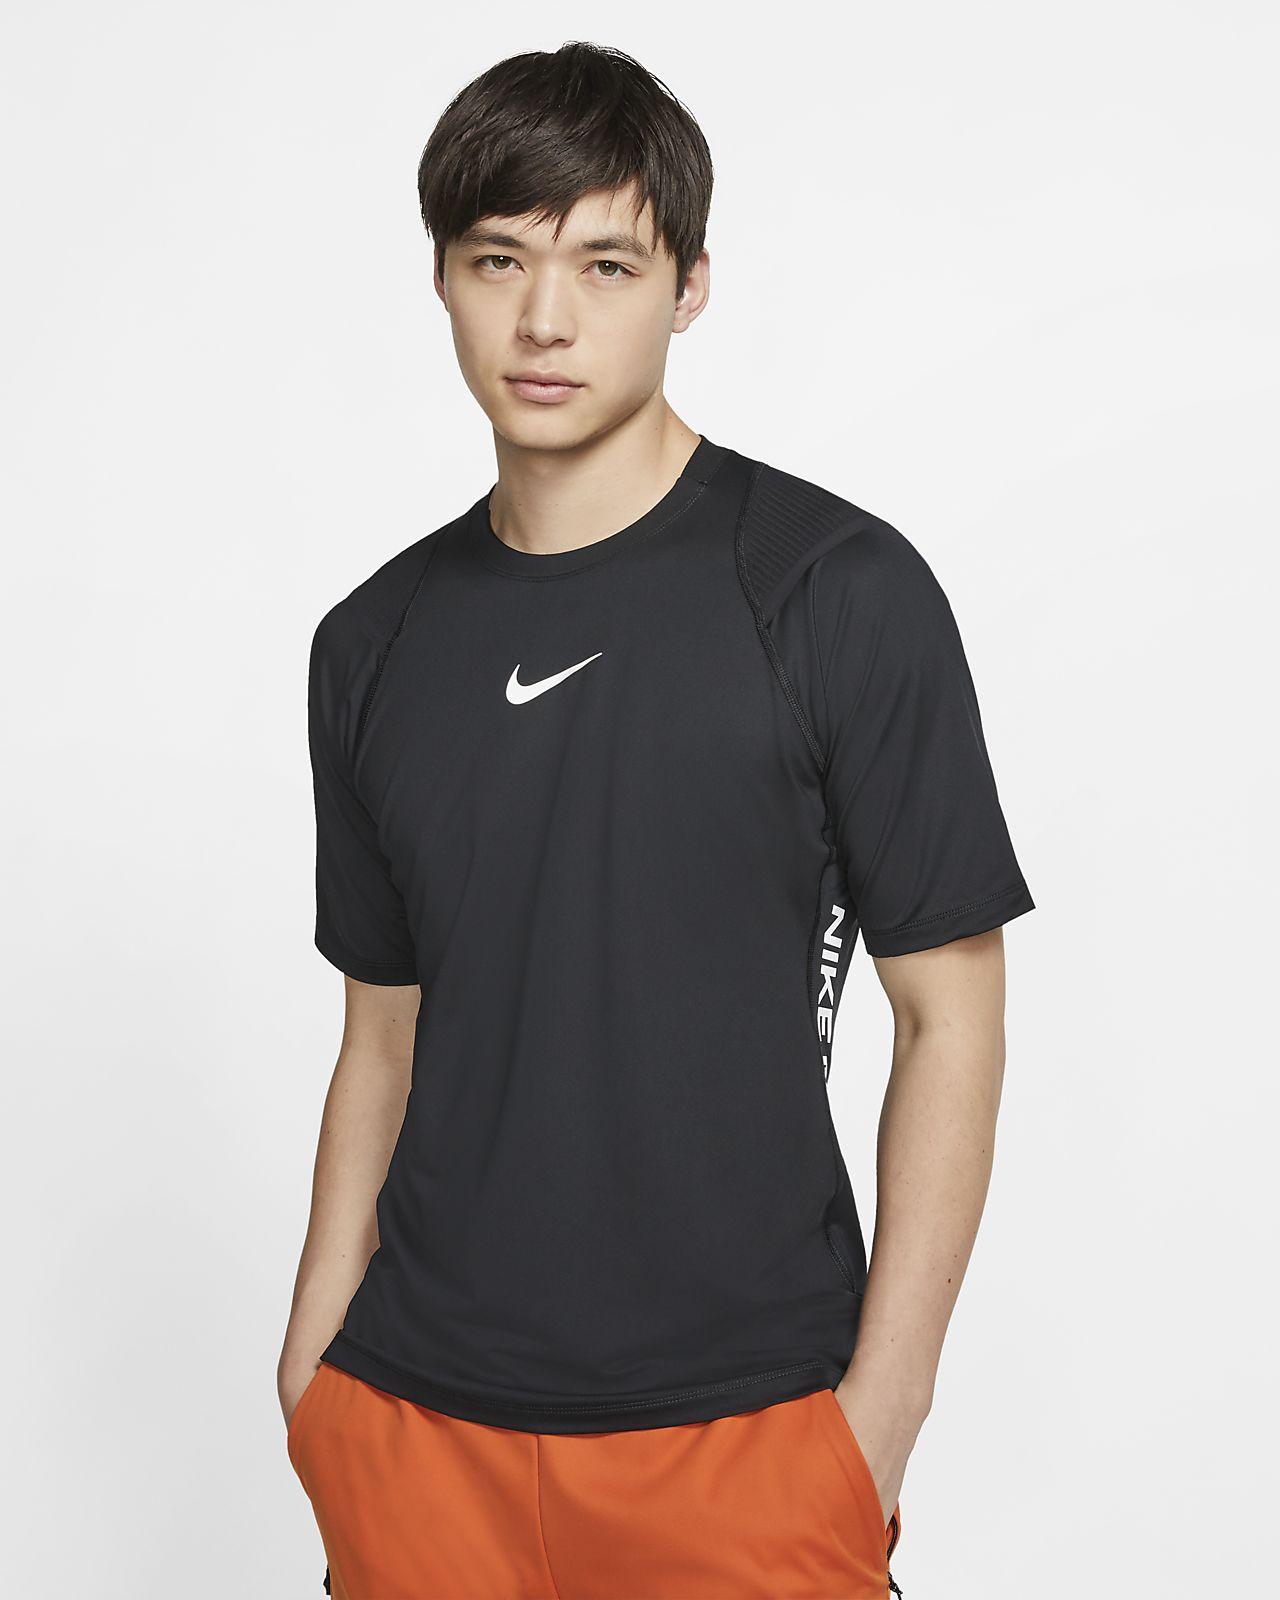 Мужская футболка с коротким рукавом Nike Pro AeroAdapt